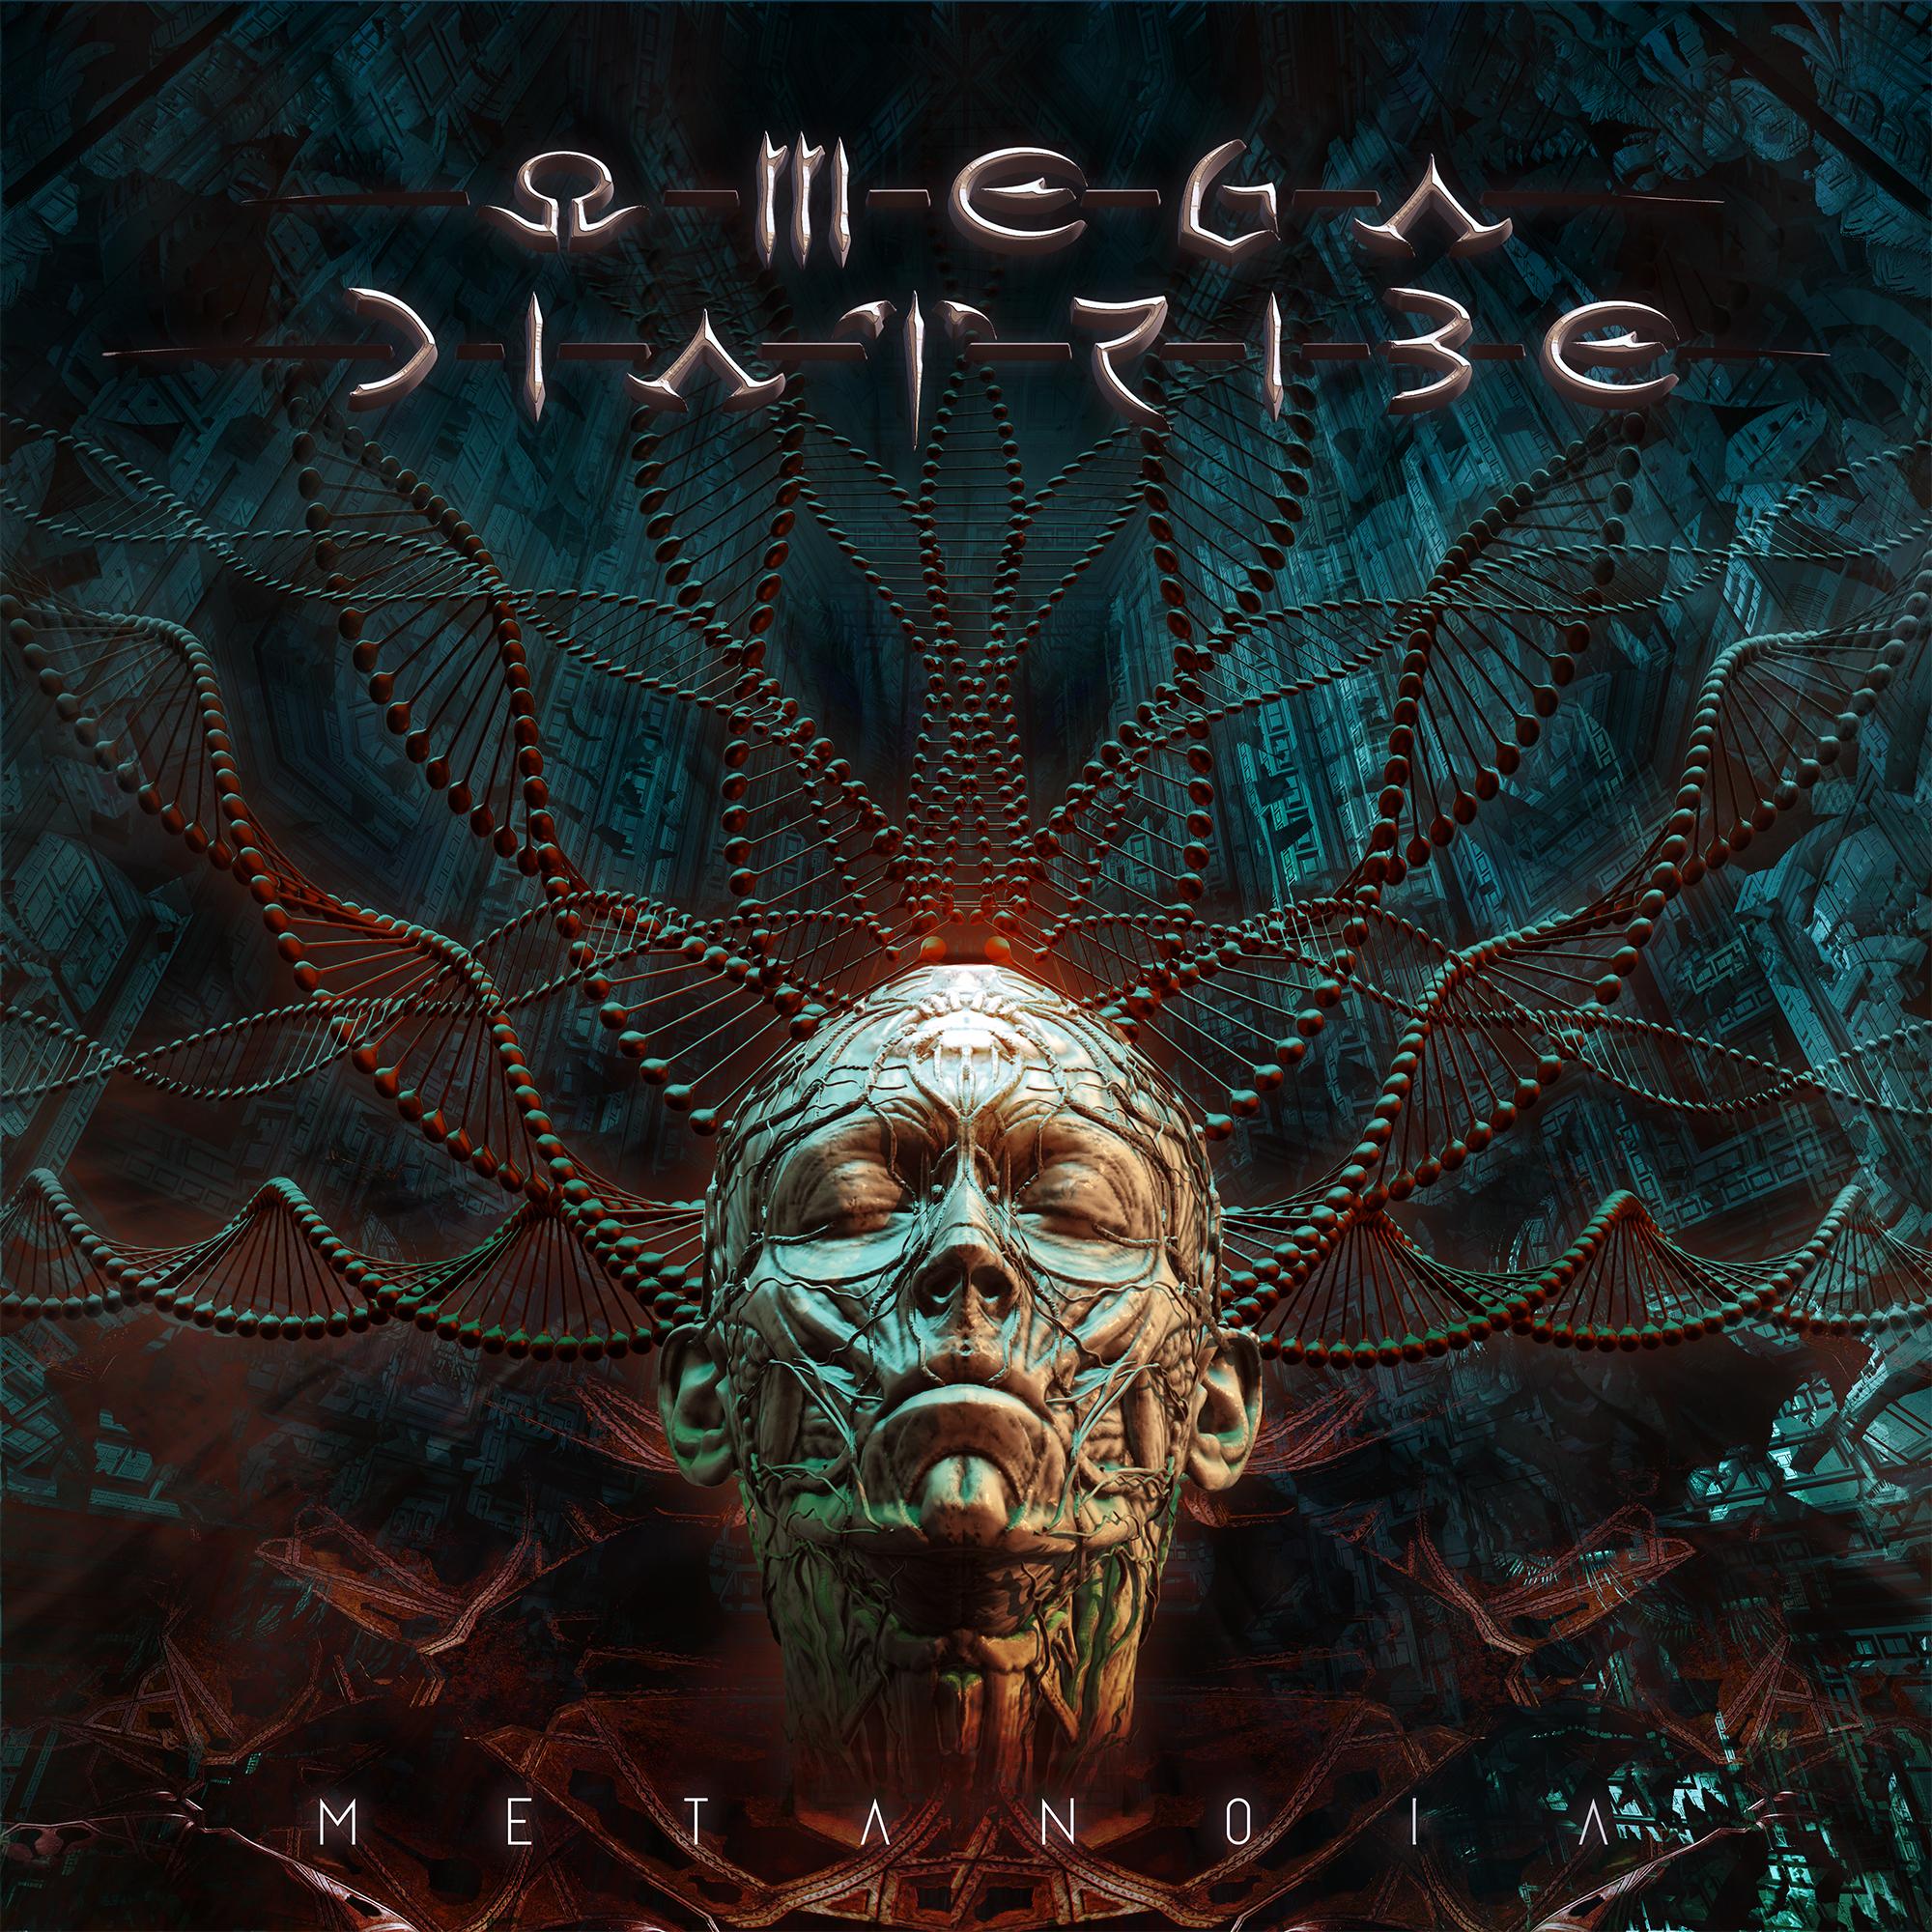 omega_diatribe_metanoia_2020.jpg